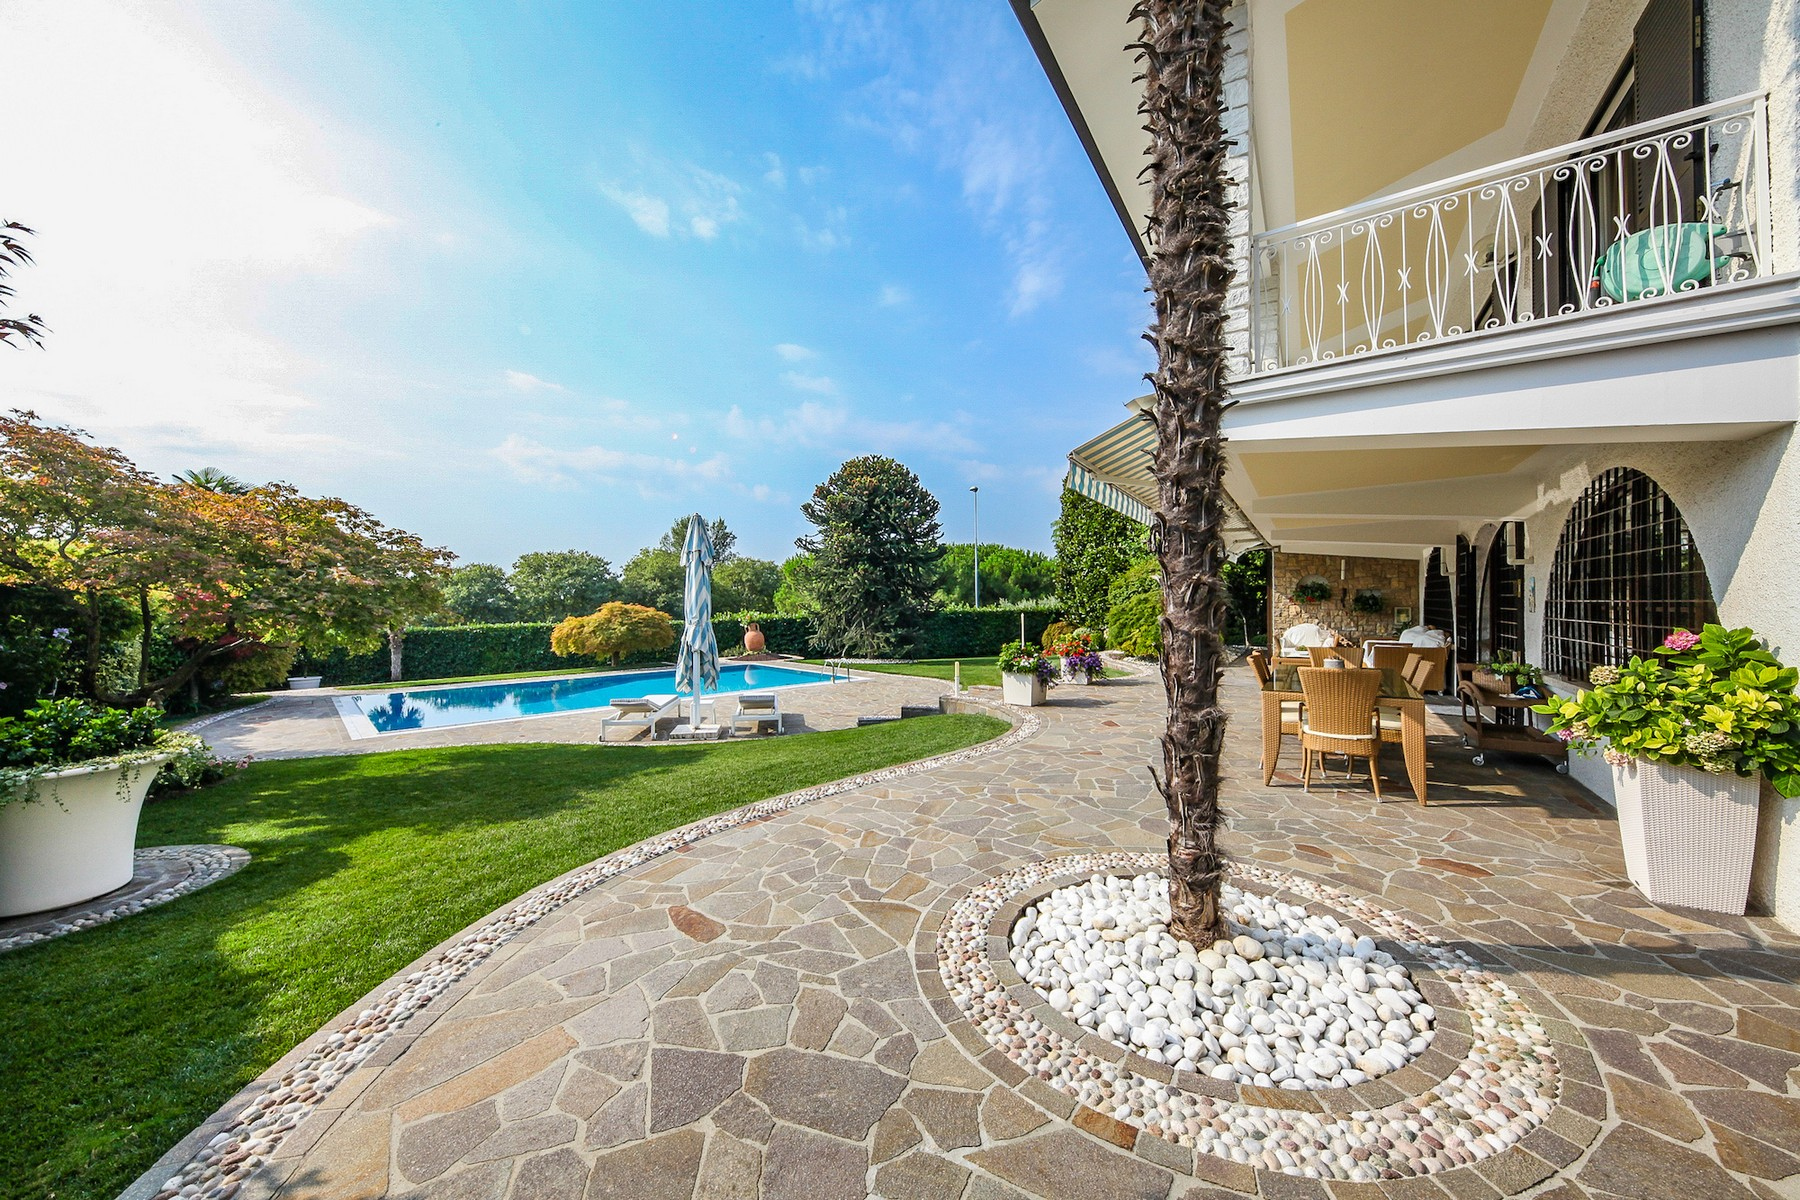 Villa in Vendita a Padenghe Sul Garda: 5 locali, 330 mq - Foto 29